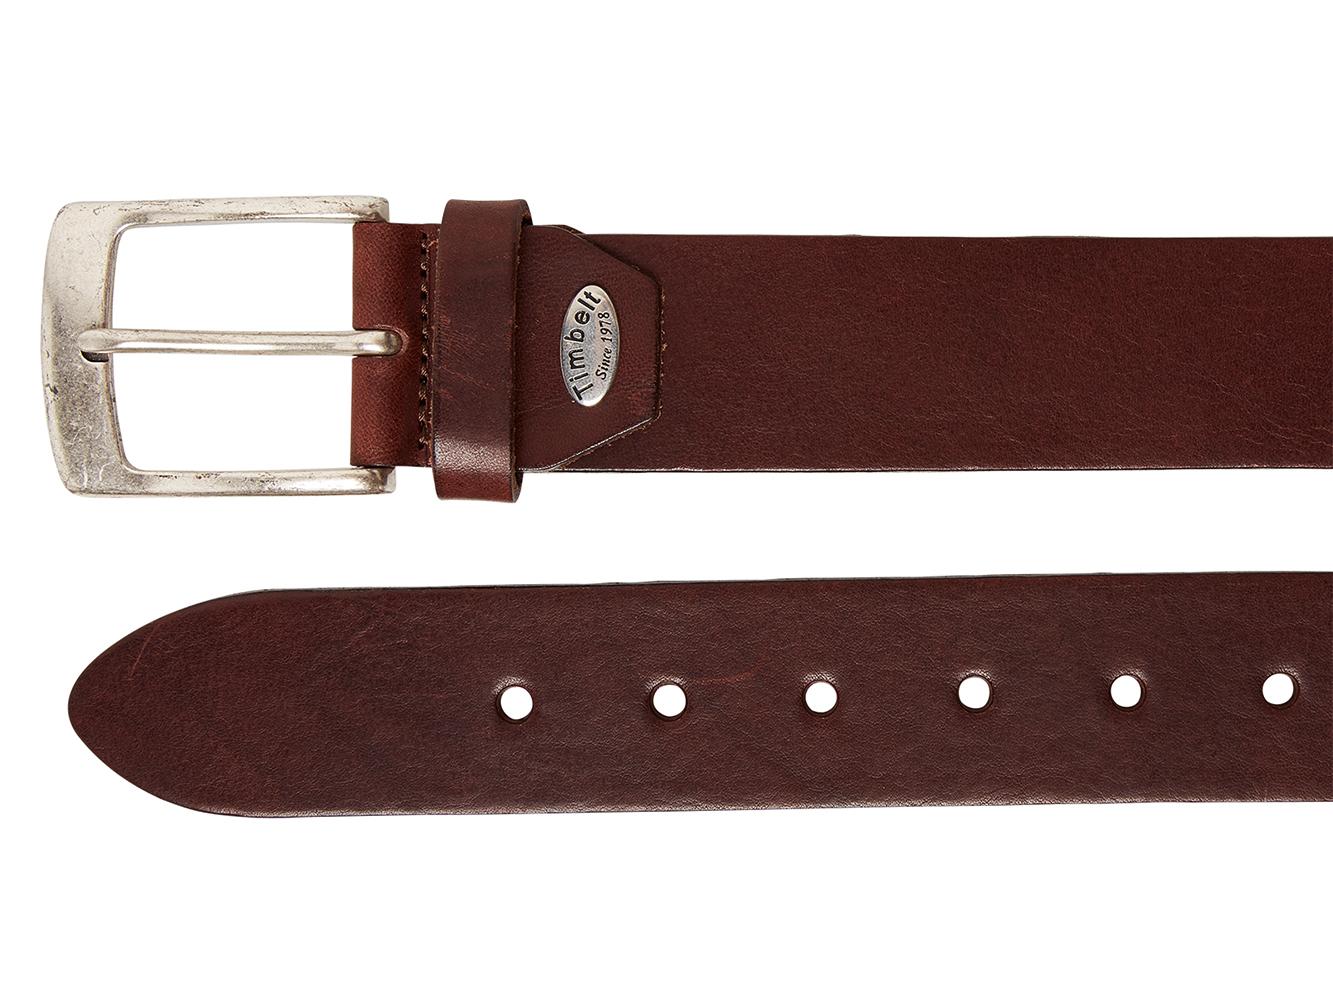 Timbelt 627 Volnerf Leren Casual - Jeans Riem 105/4 cm Bruin